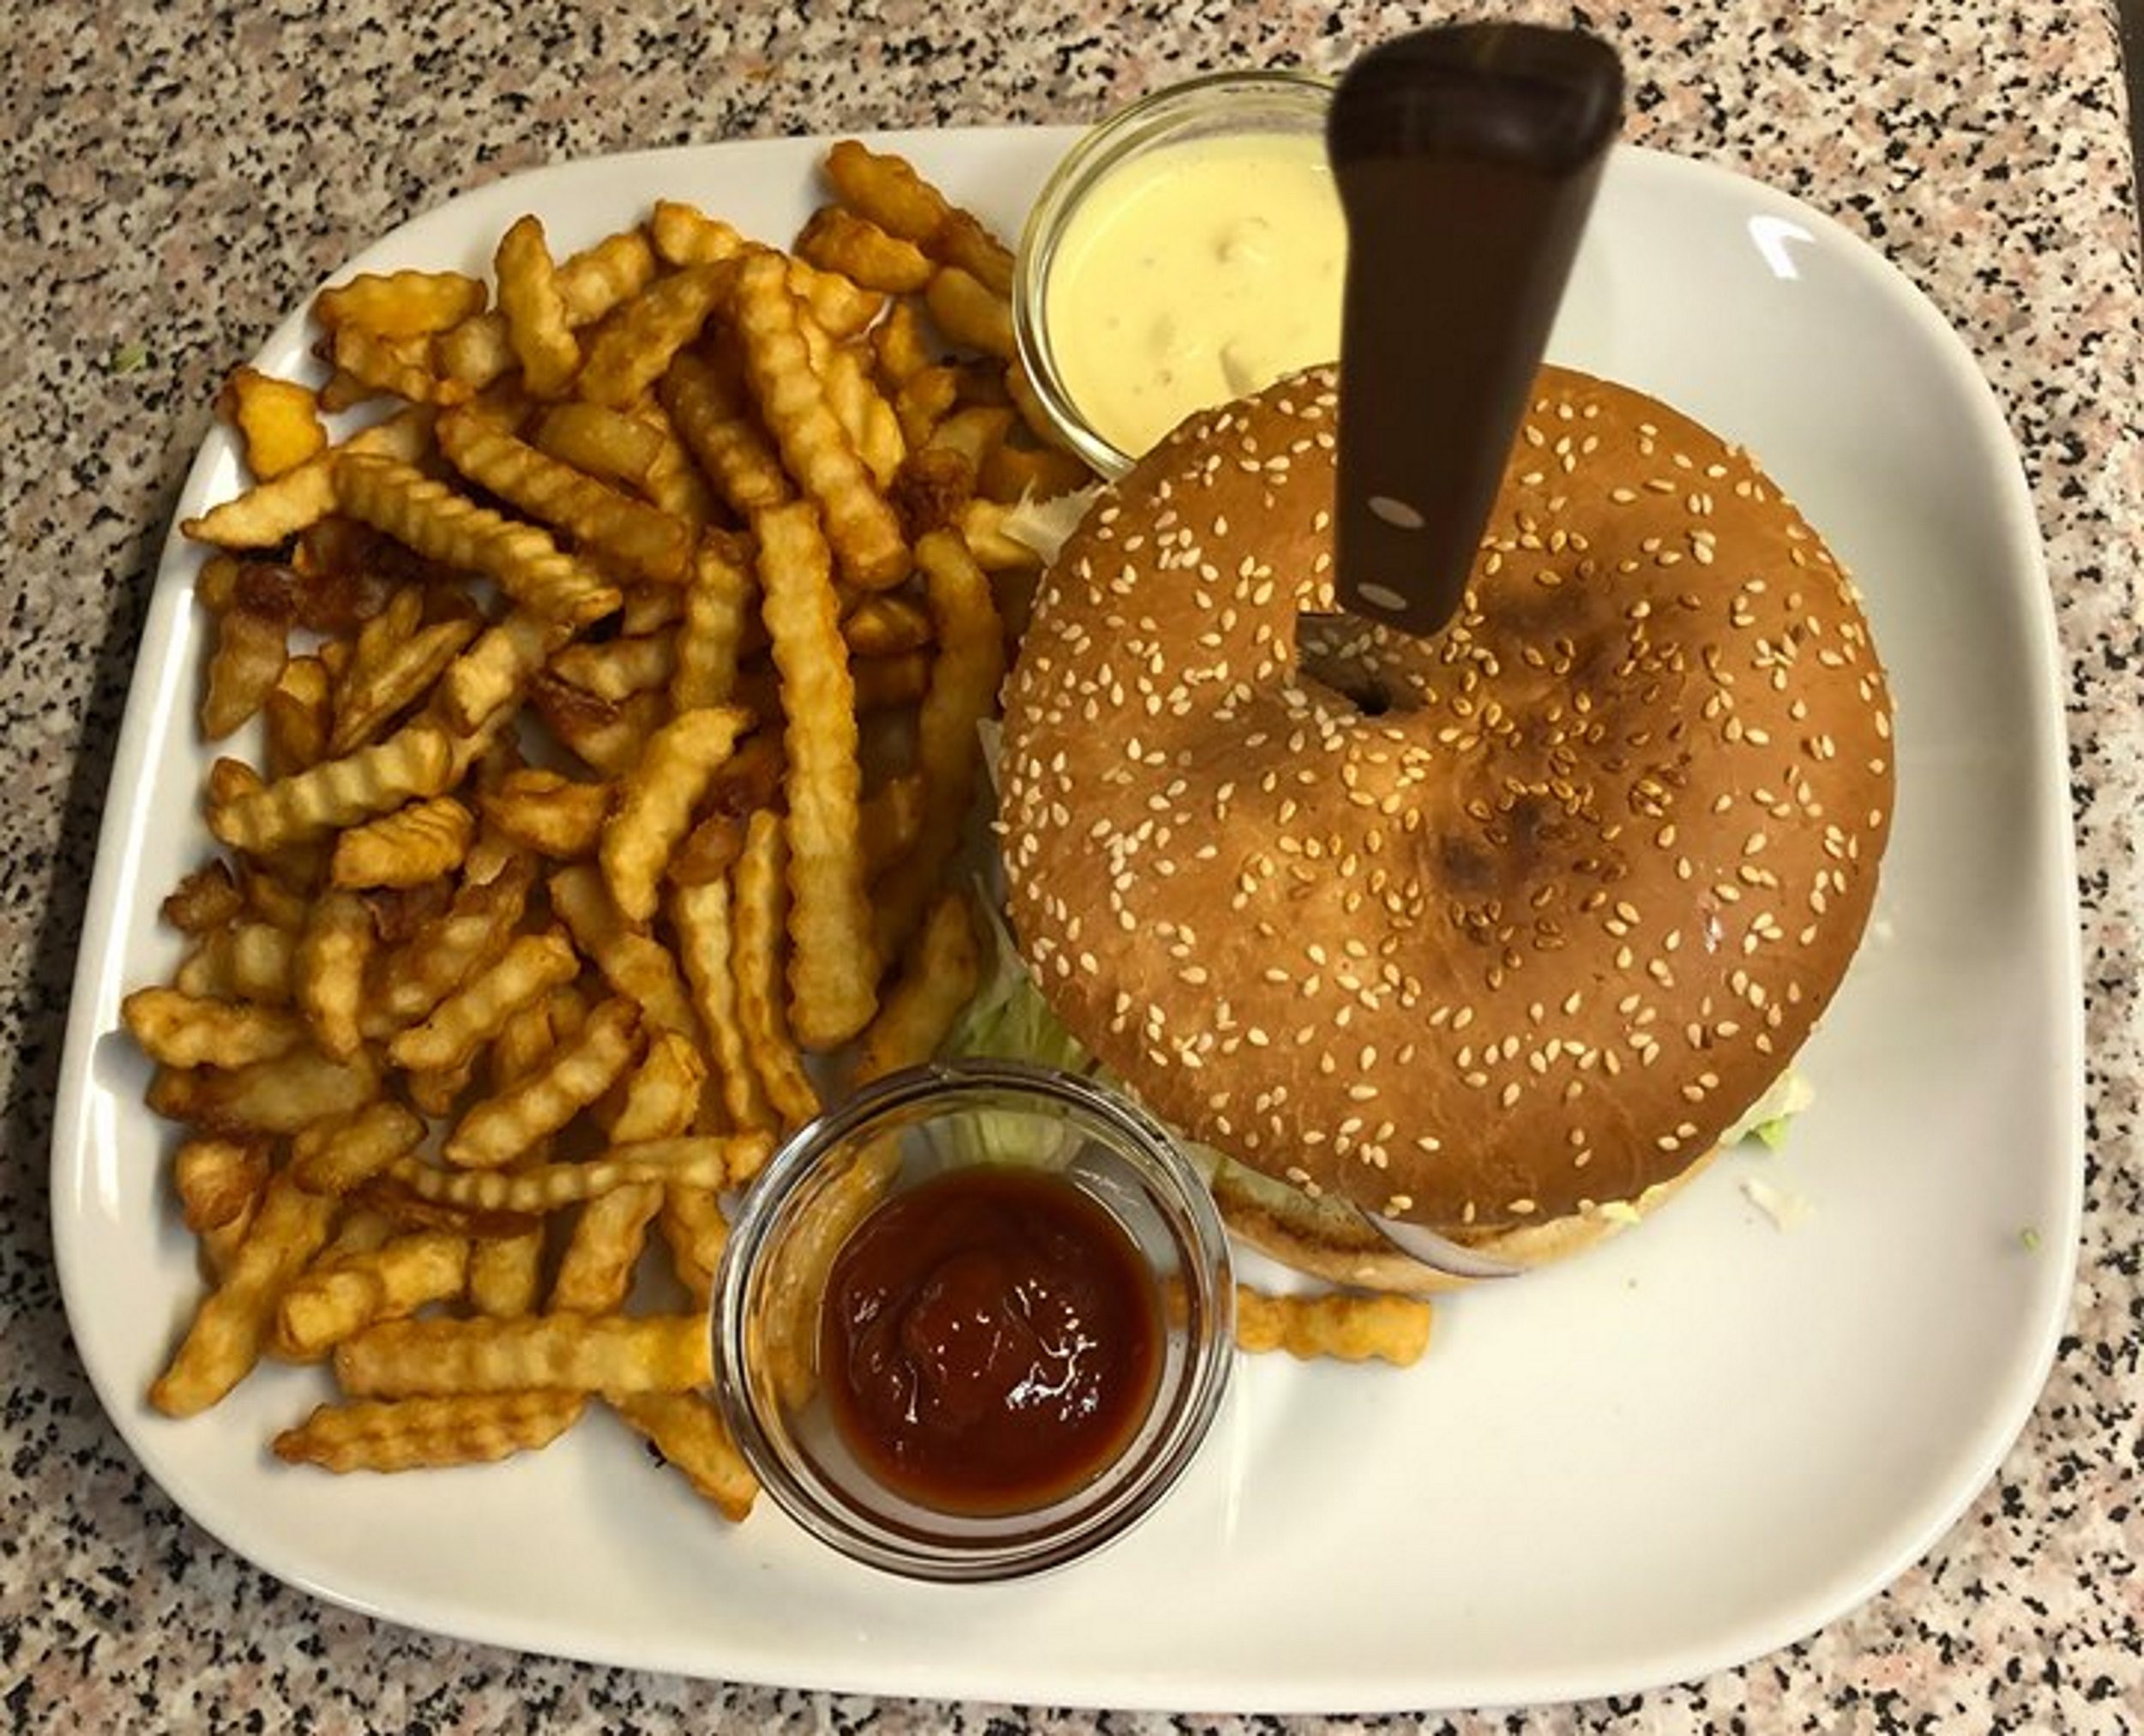 Nummelan parhaimmat burgerit